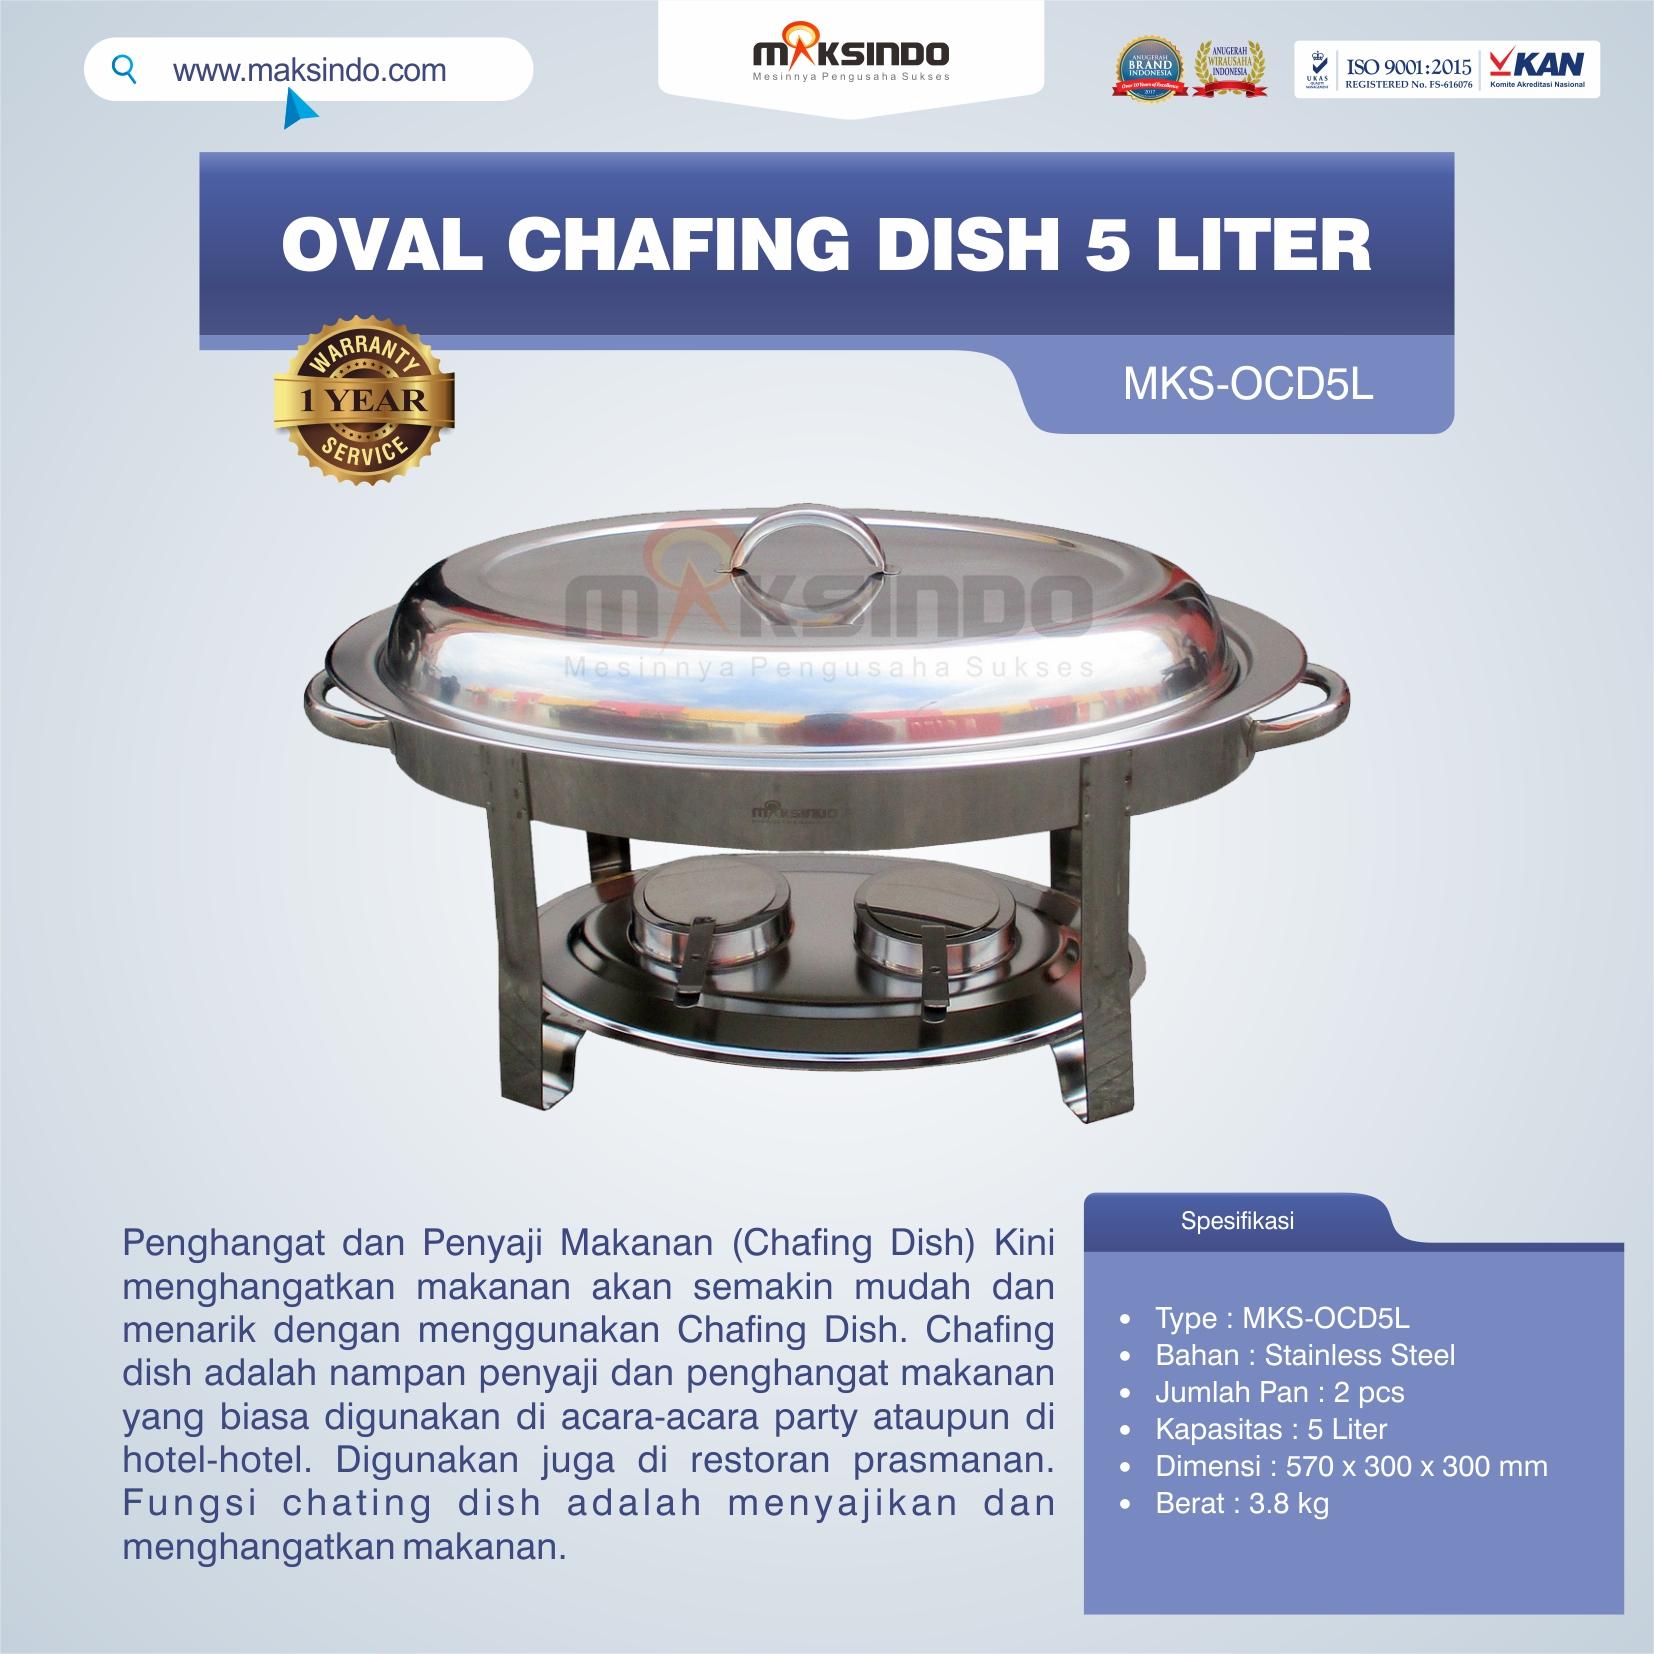 Jual Oval Chafing Dish 5 Liter di Blitar